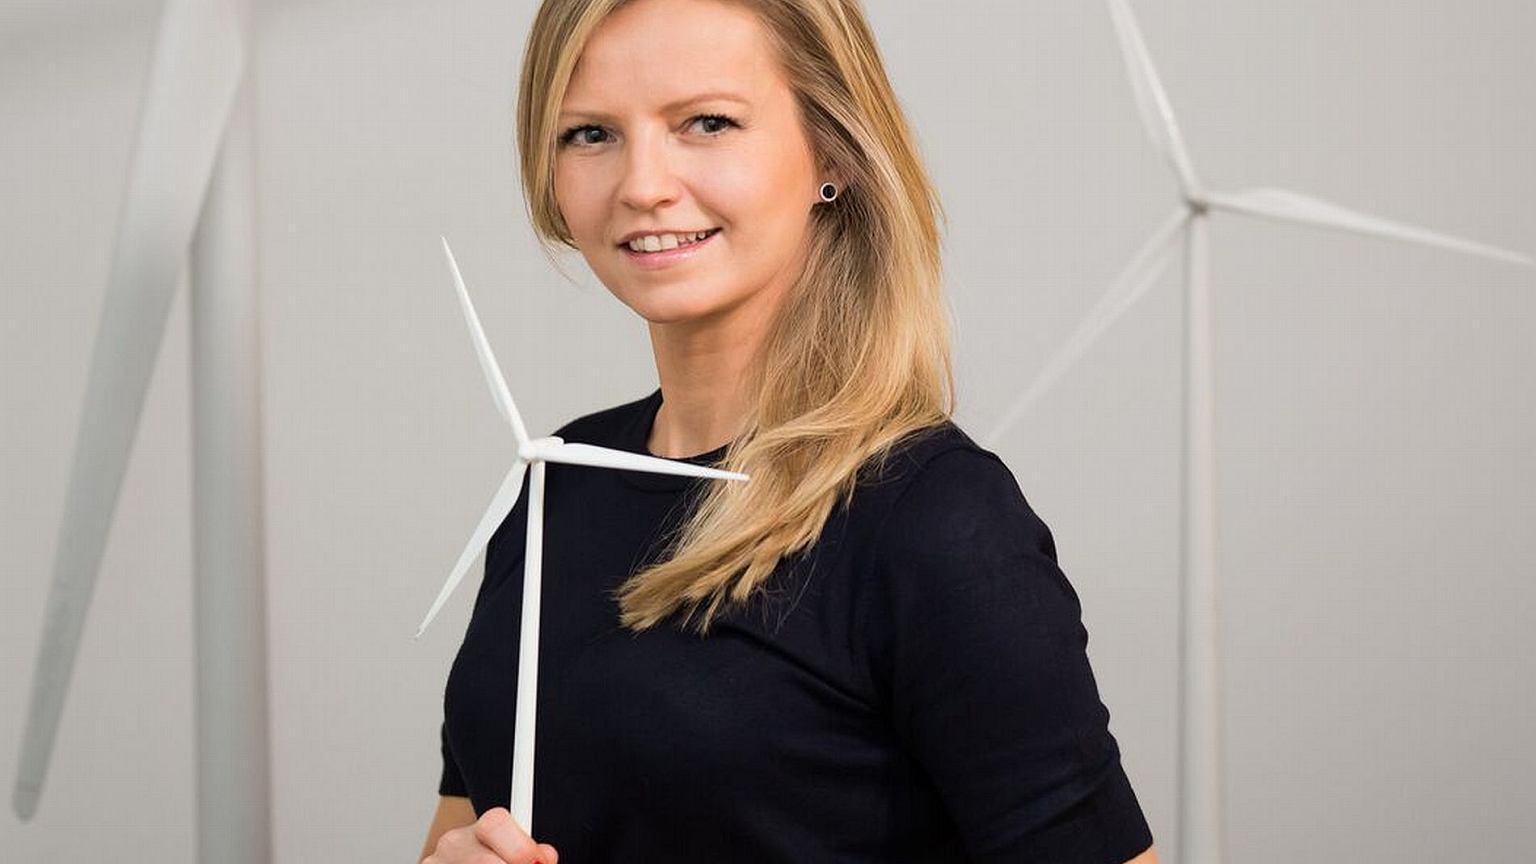 Małgorzata Bartosik